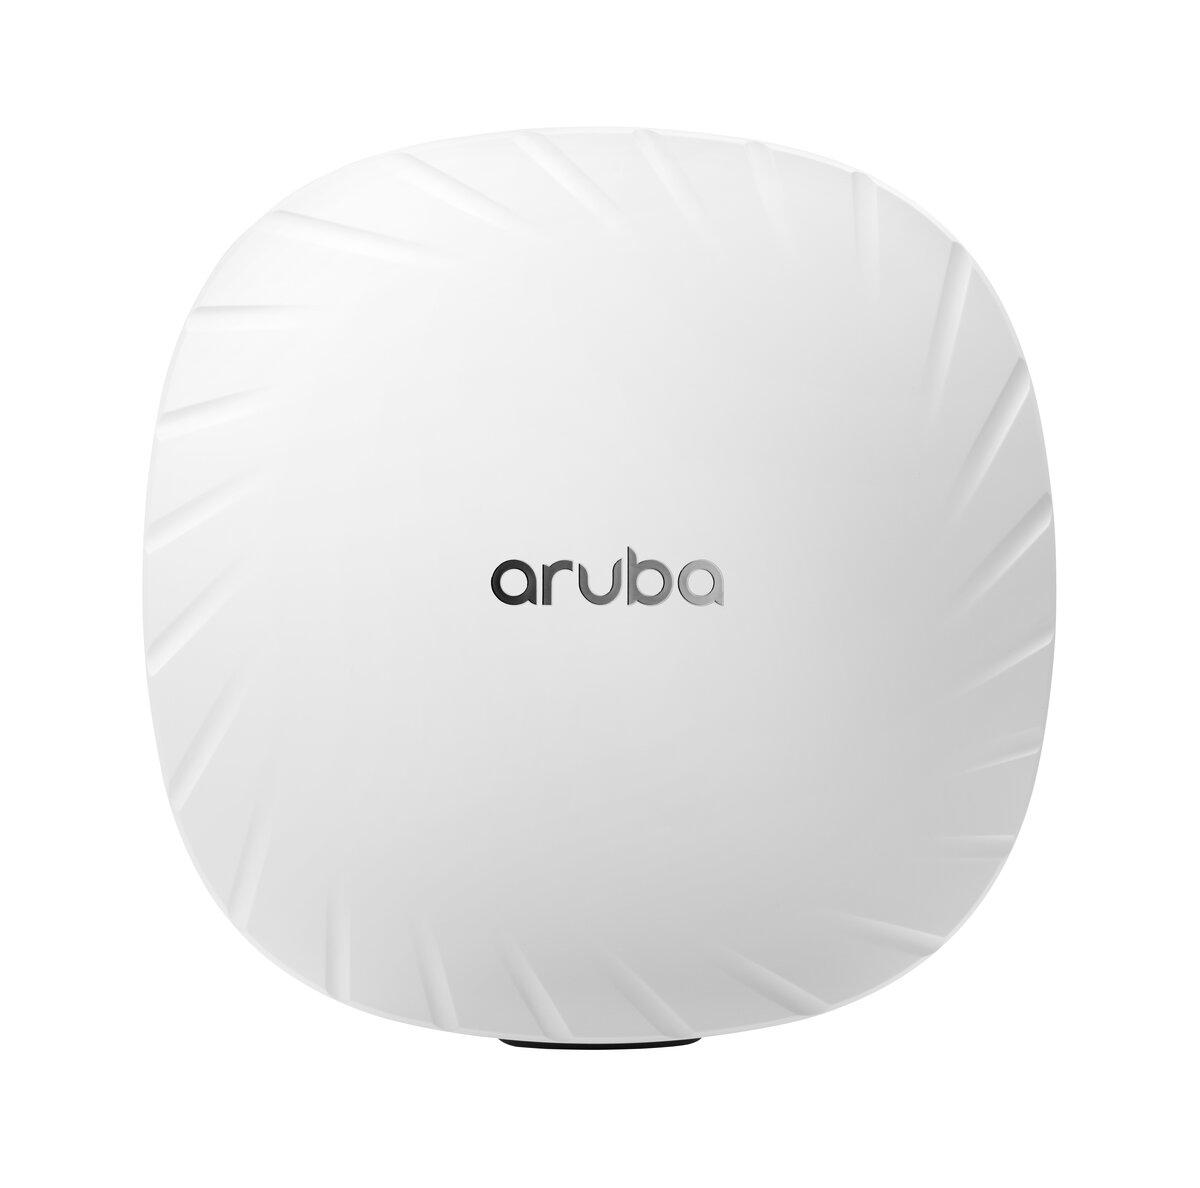 Hewlett Packard Enterprise Aruba AP-535 (RW) WLAN access point 3550 Mbit/s Power over Ethernet (PoE) White